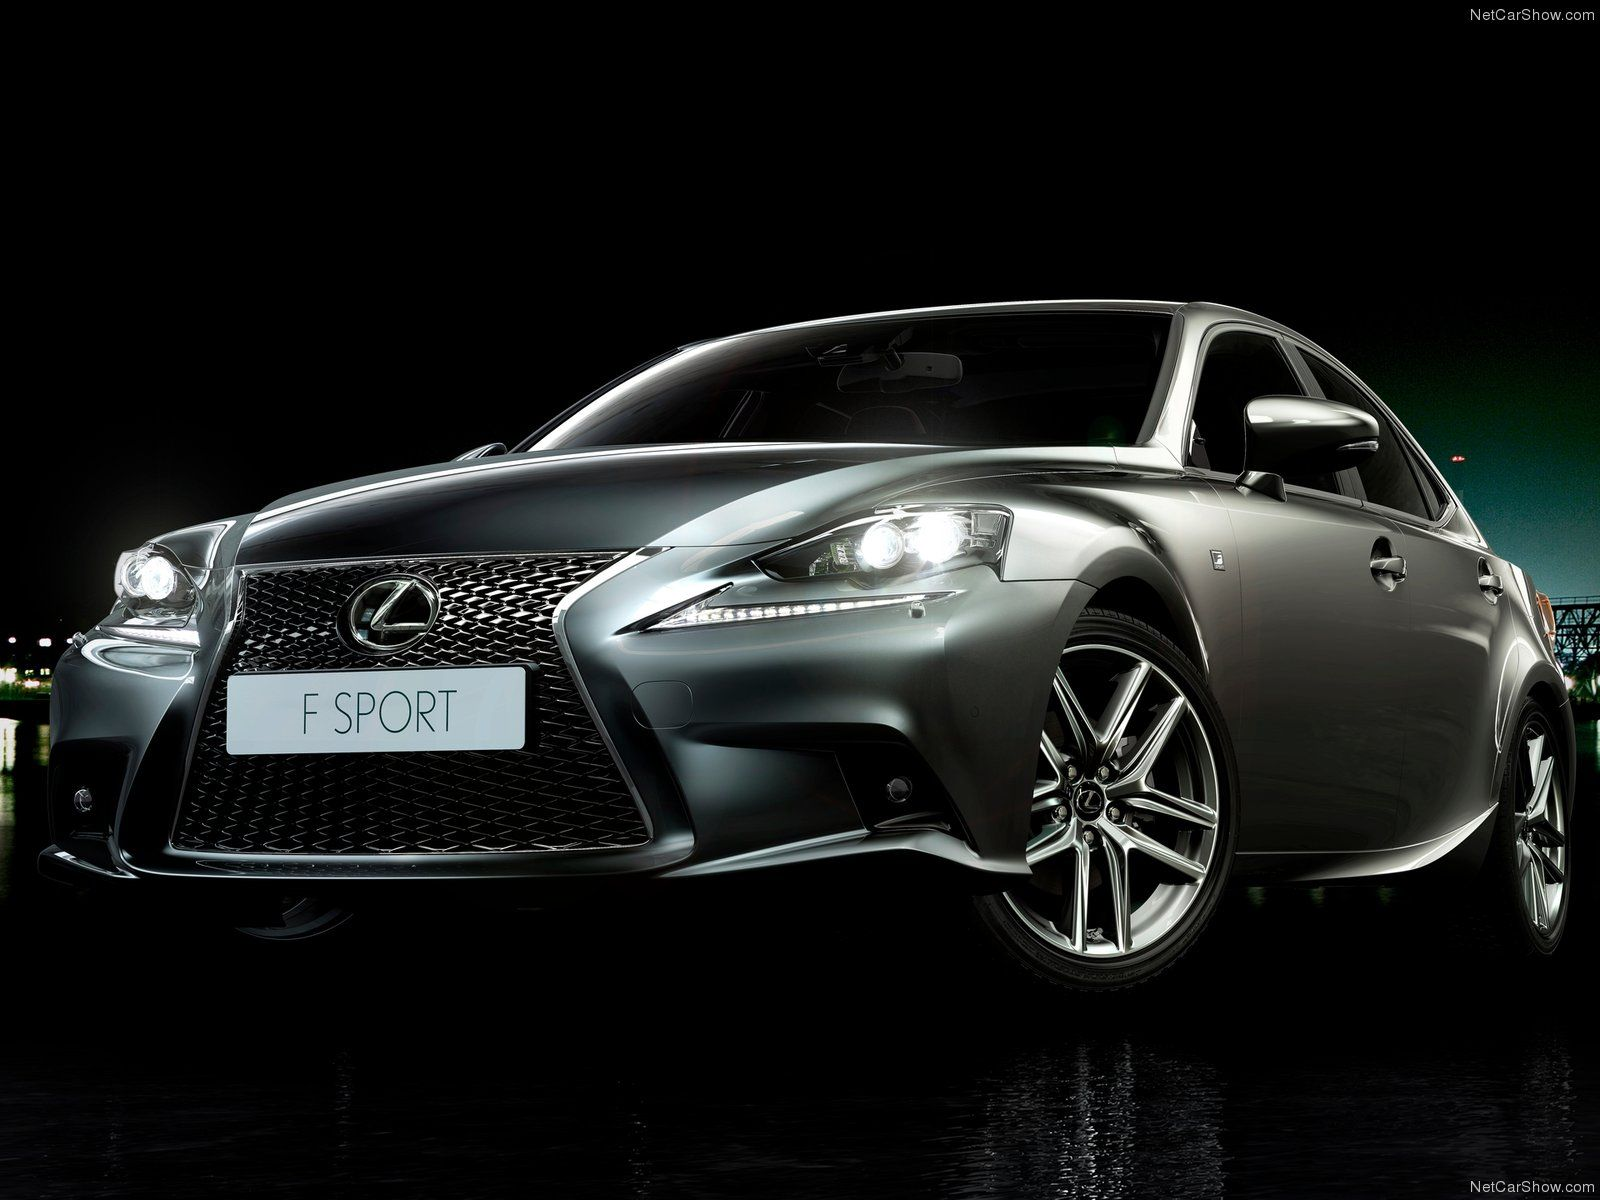 2014 Lexus ISF Sport luxurycars New lexus, Lexus models